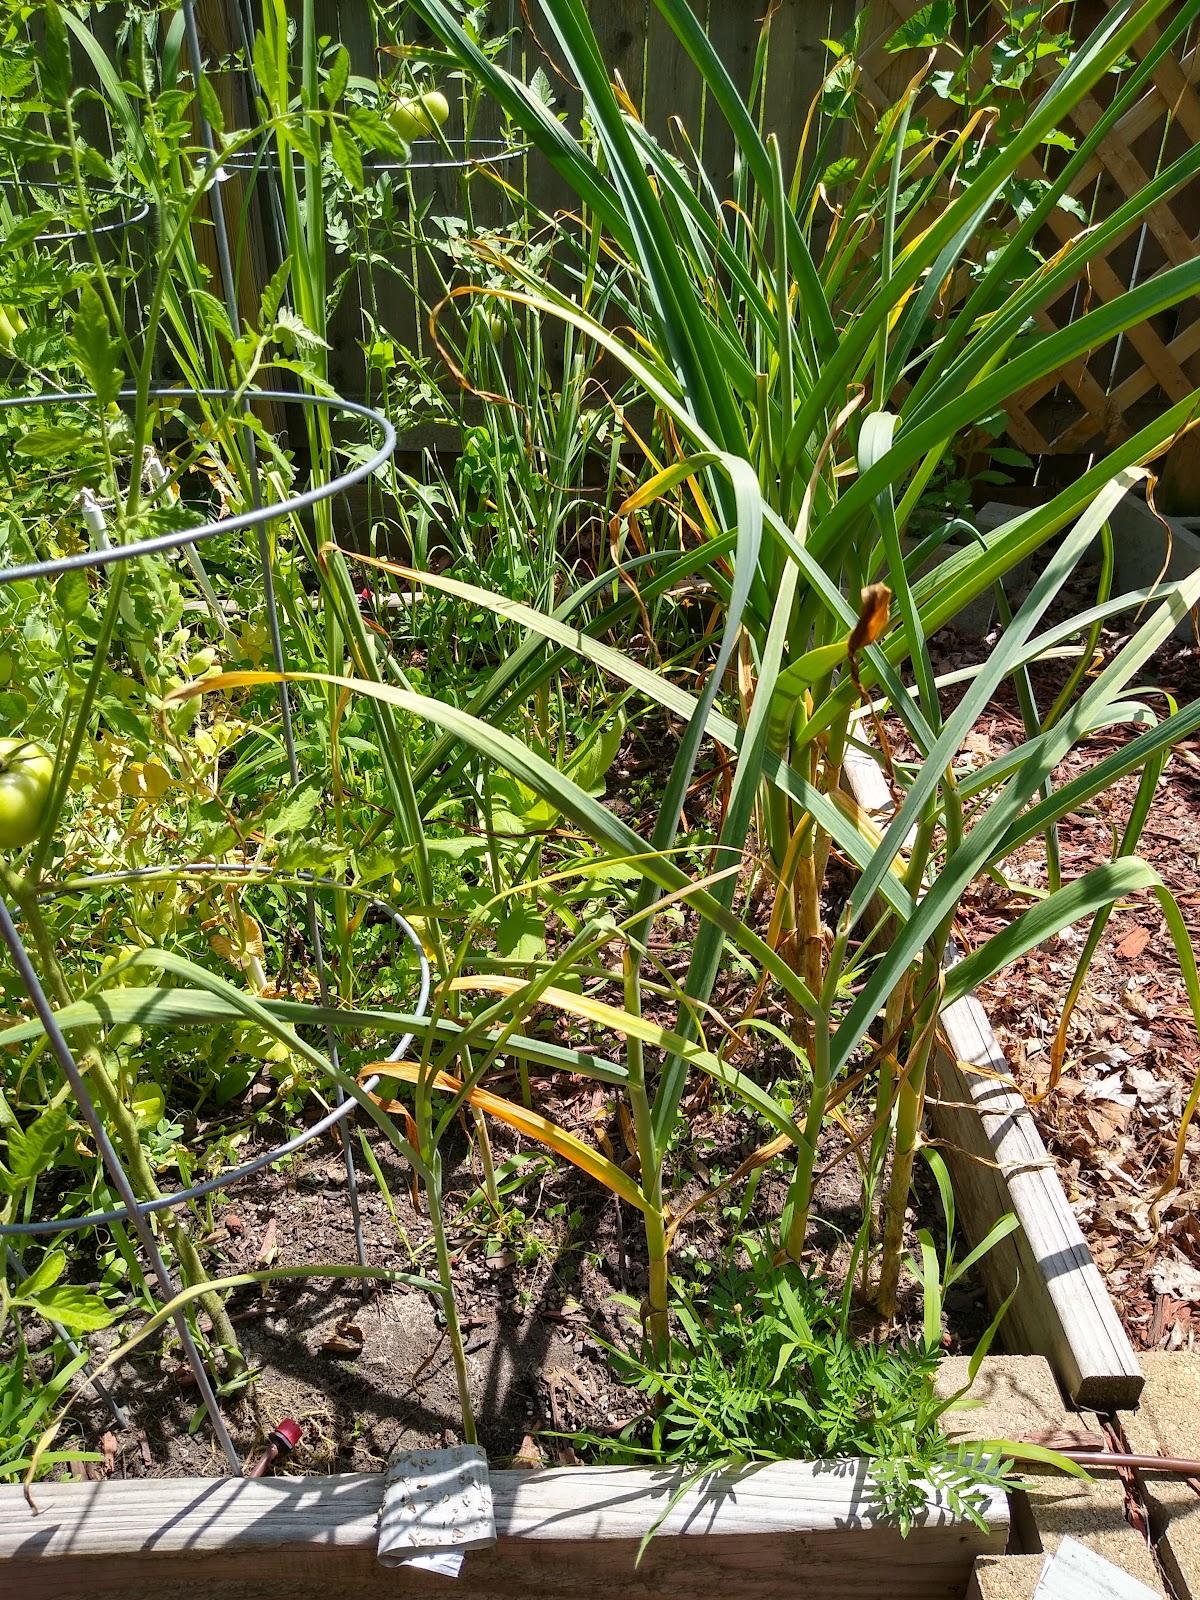 garlic plants picture